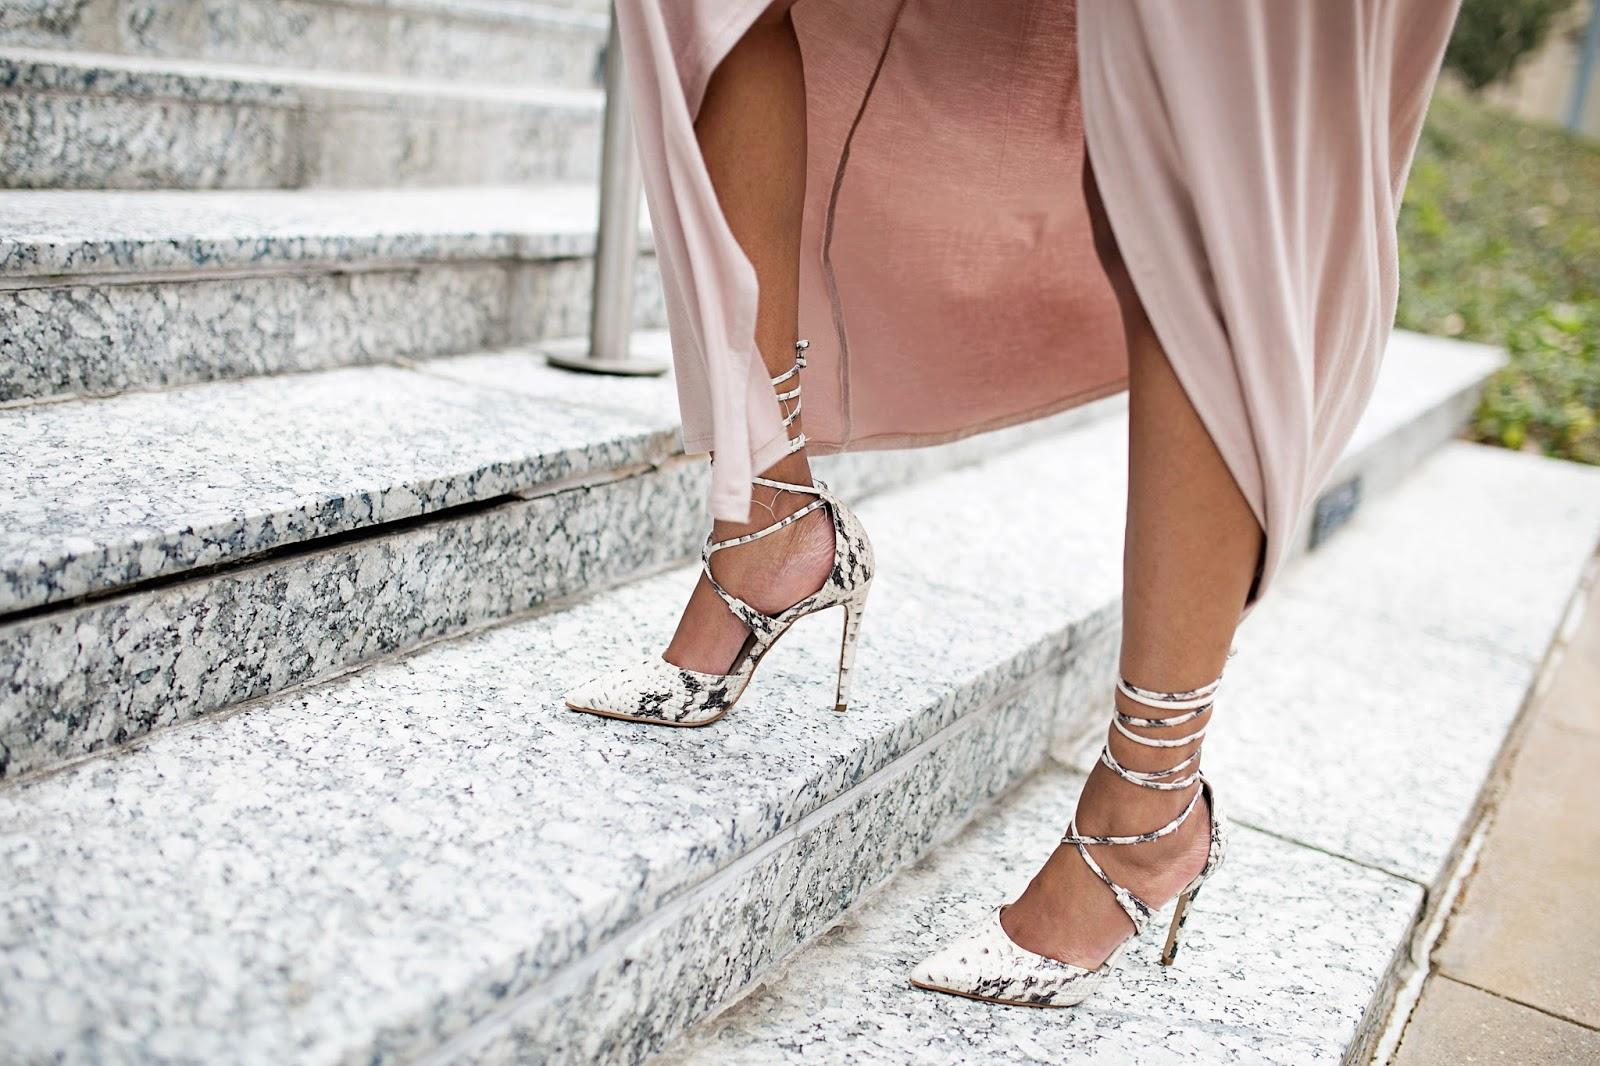 wrap dress, maxi dress, winter maxi dress, nude dress, blush pink dress, forever 21, sequin clutch, target handbag, steve madden raela, druzy bracelets, statement necklace, H&M, dallas blogger, fashion blogger, black girl blogger, detroit blogger